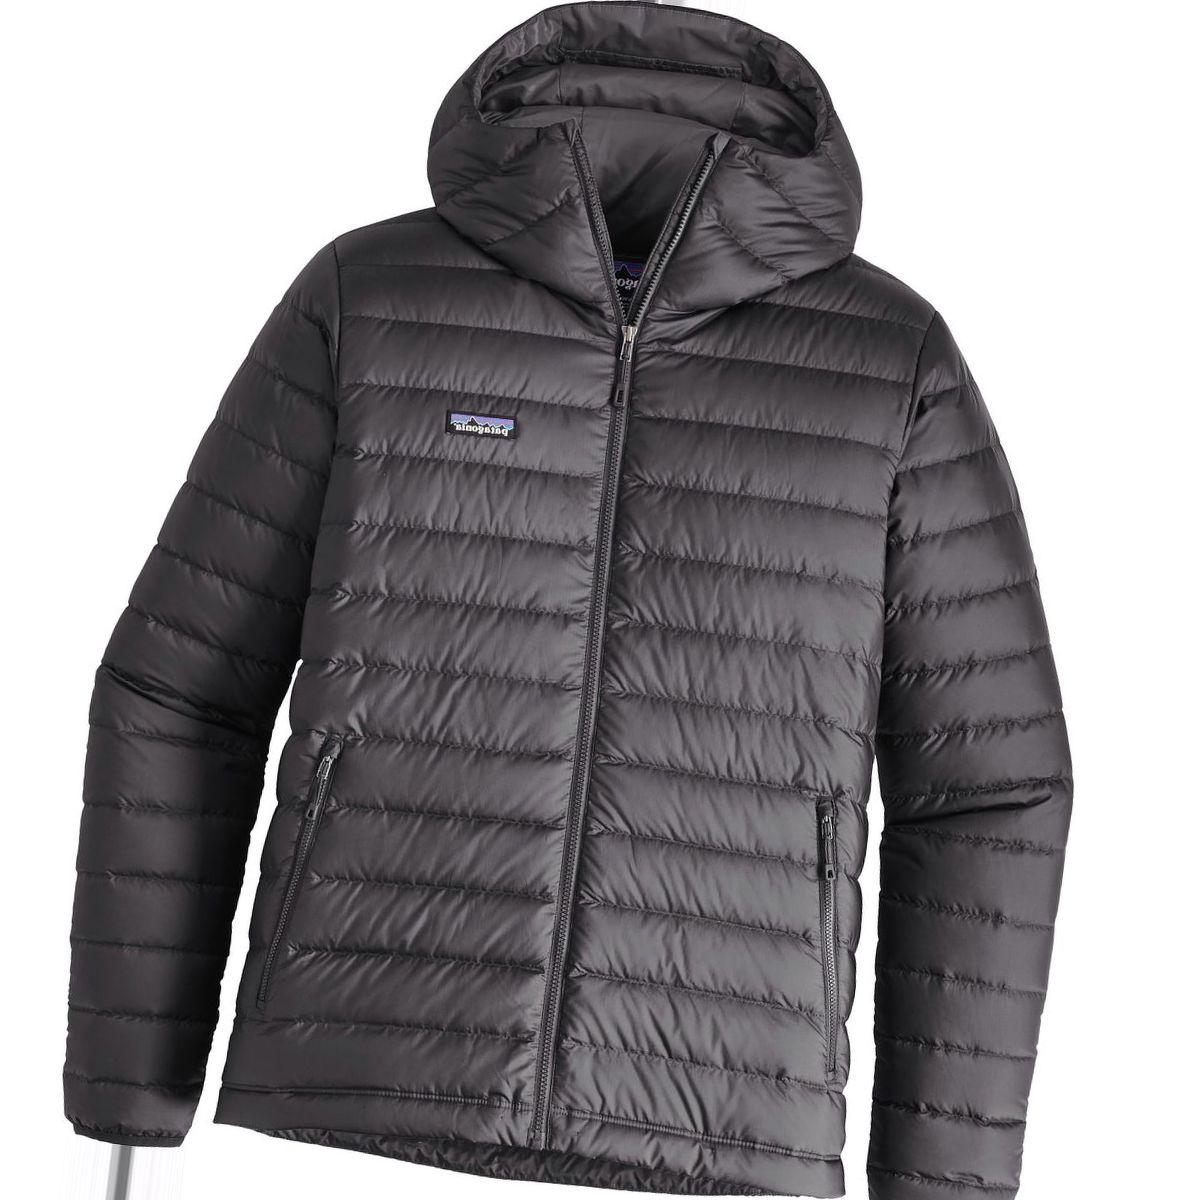 Patagonia Down Sweater Hooded Jacket - Men's